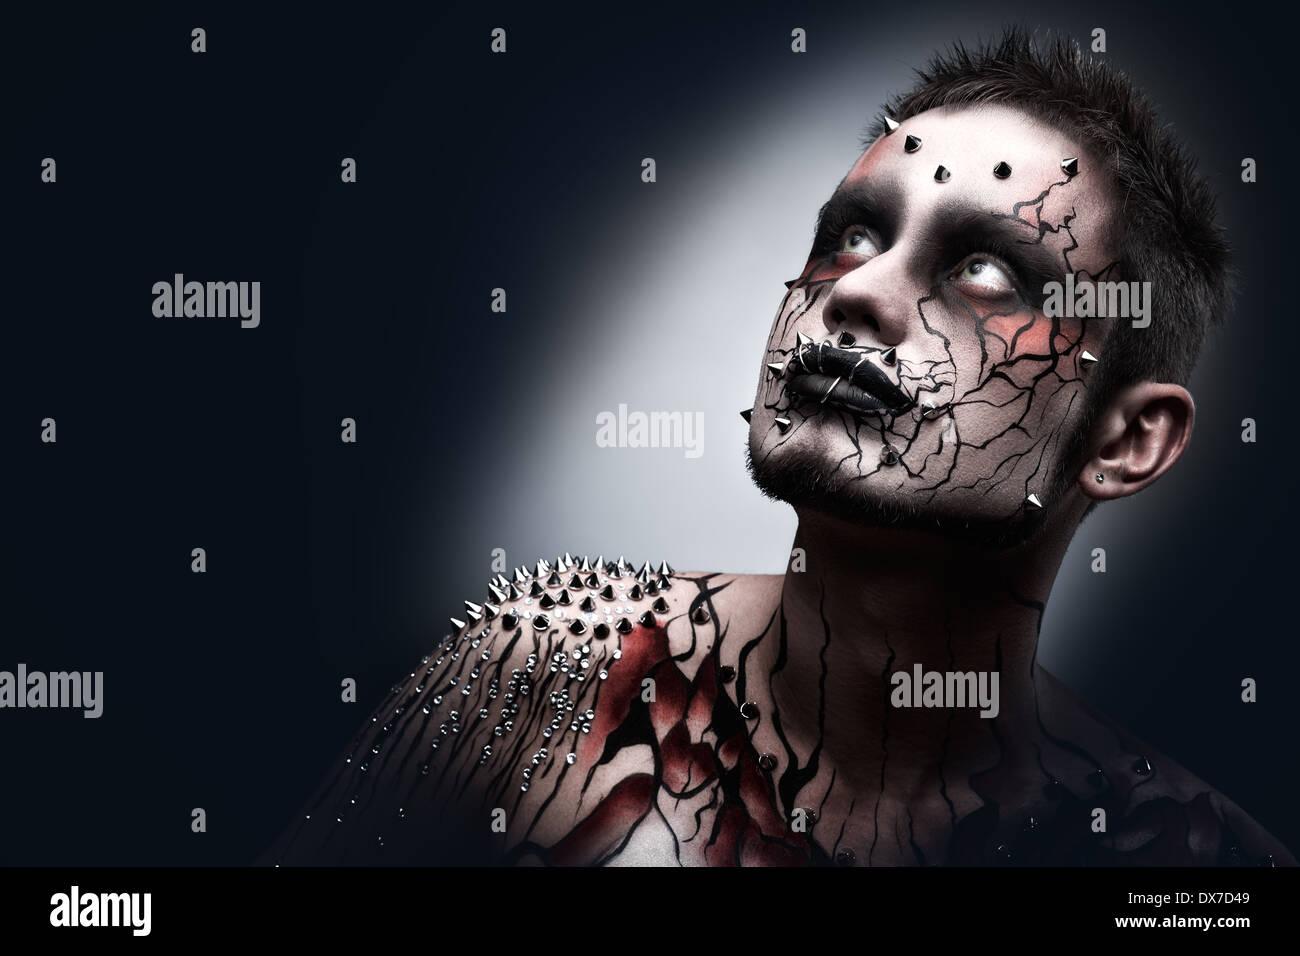 Un maquillage halloween effrayant d'un dark moor avec sérieux un peircing et effrayant l'art corporel. Photo Stock